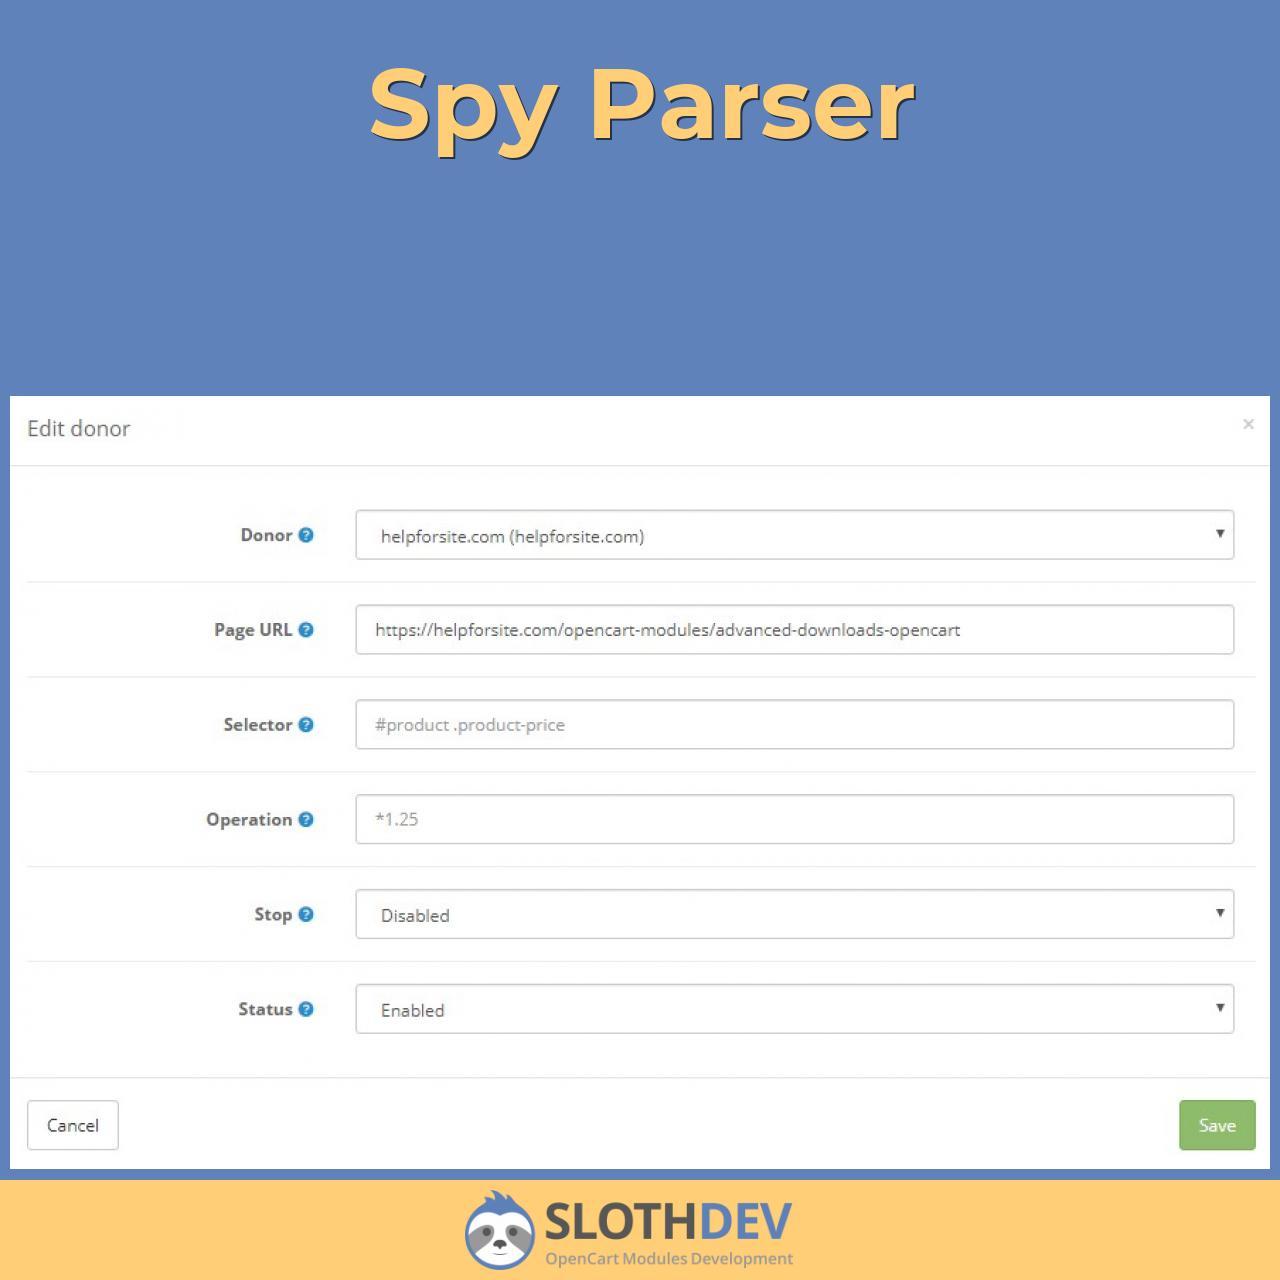 Spy Parser